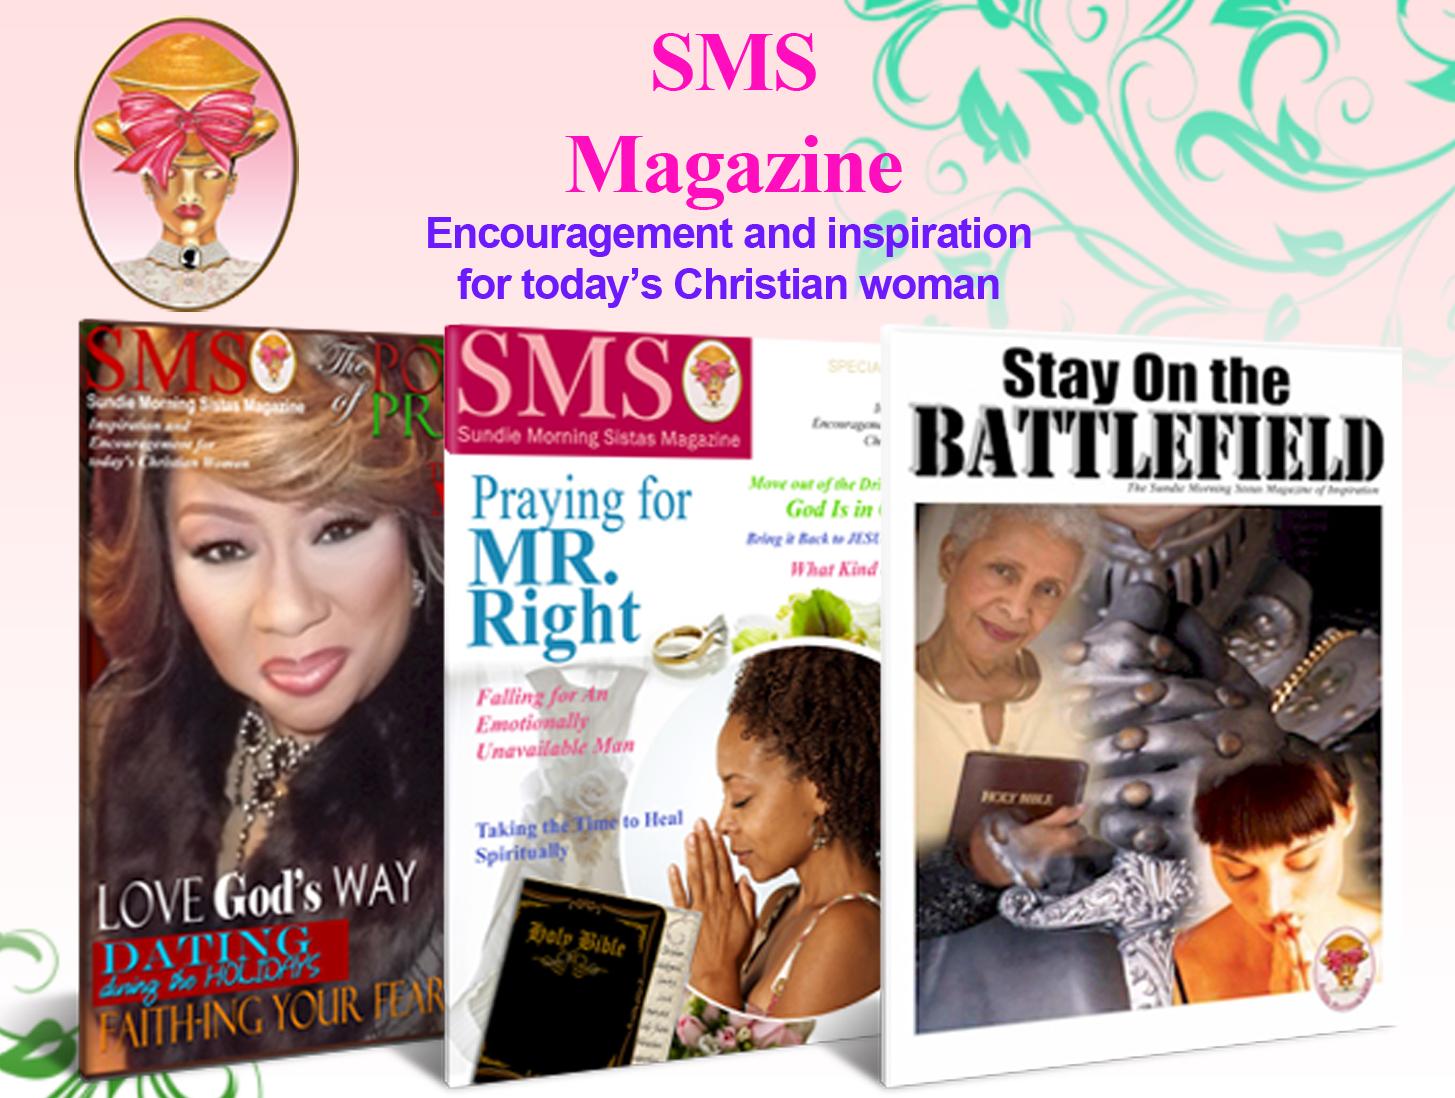 SMS Magazines